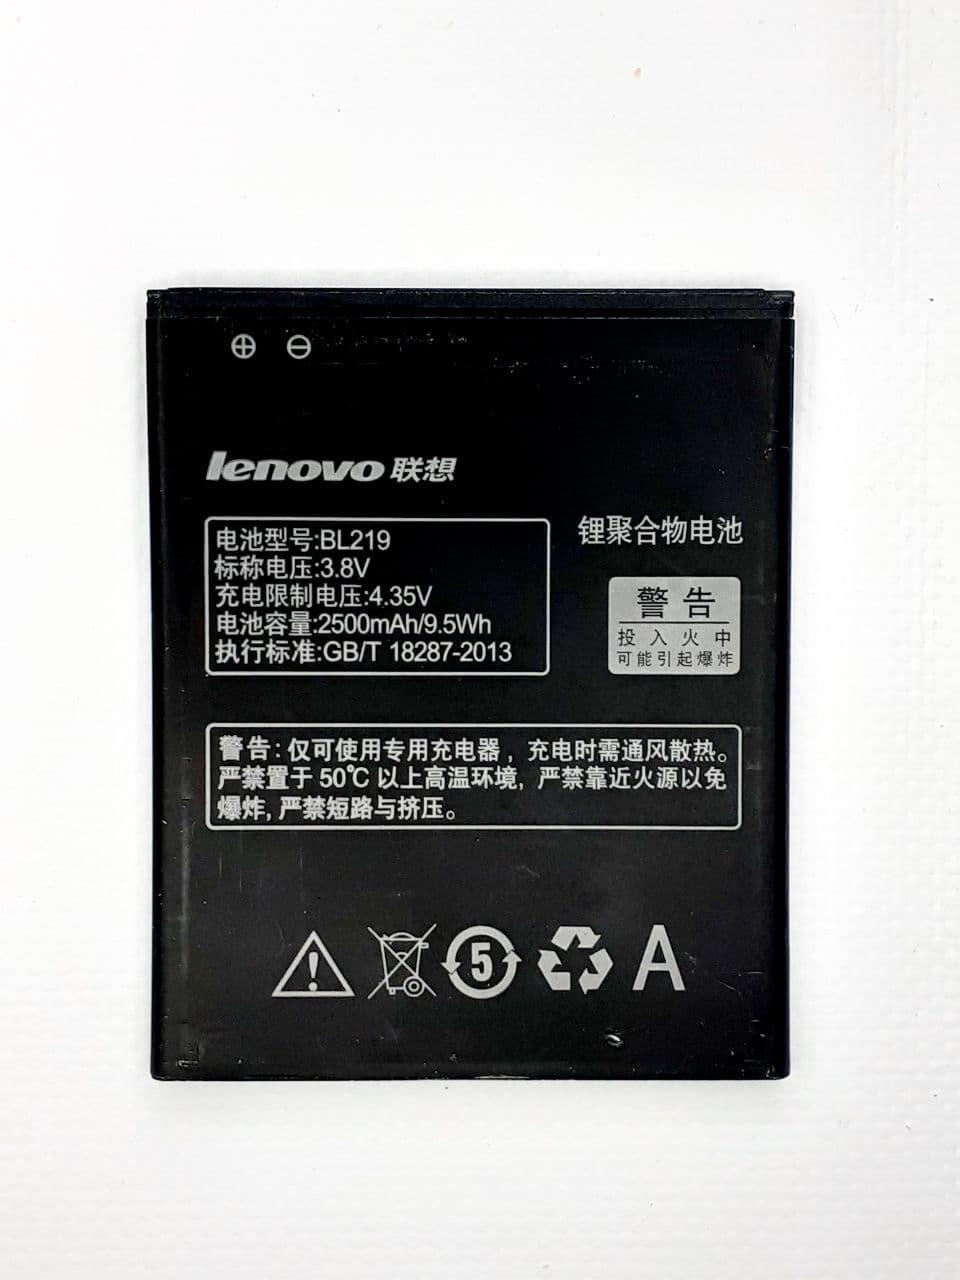 Аккумулятор Lenovo BL219 для A805e, A850+, A880, A889, A916, S856 оригинал б.у.